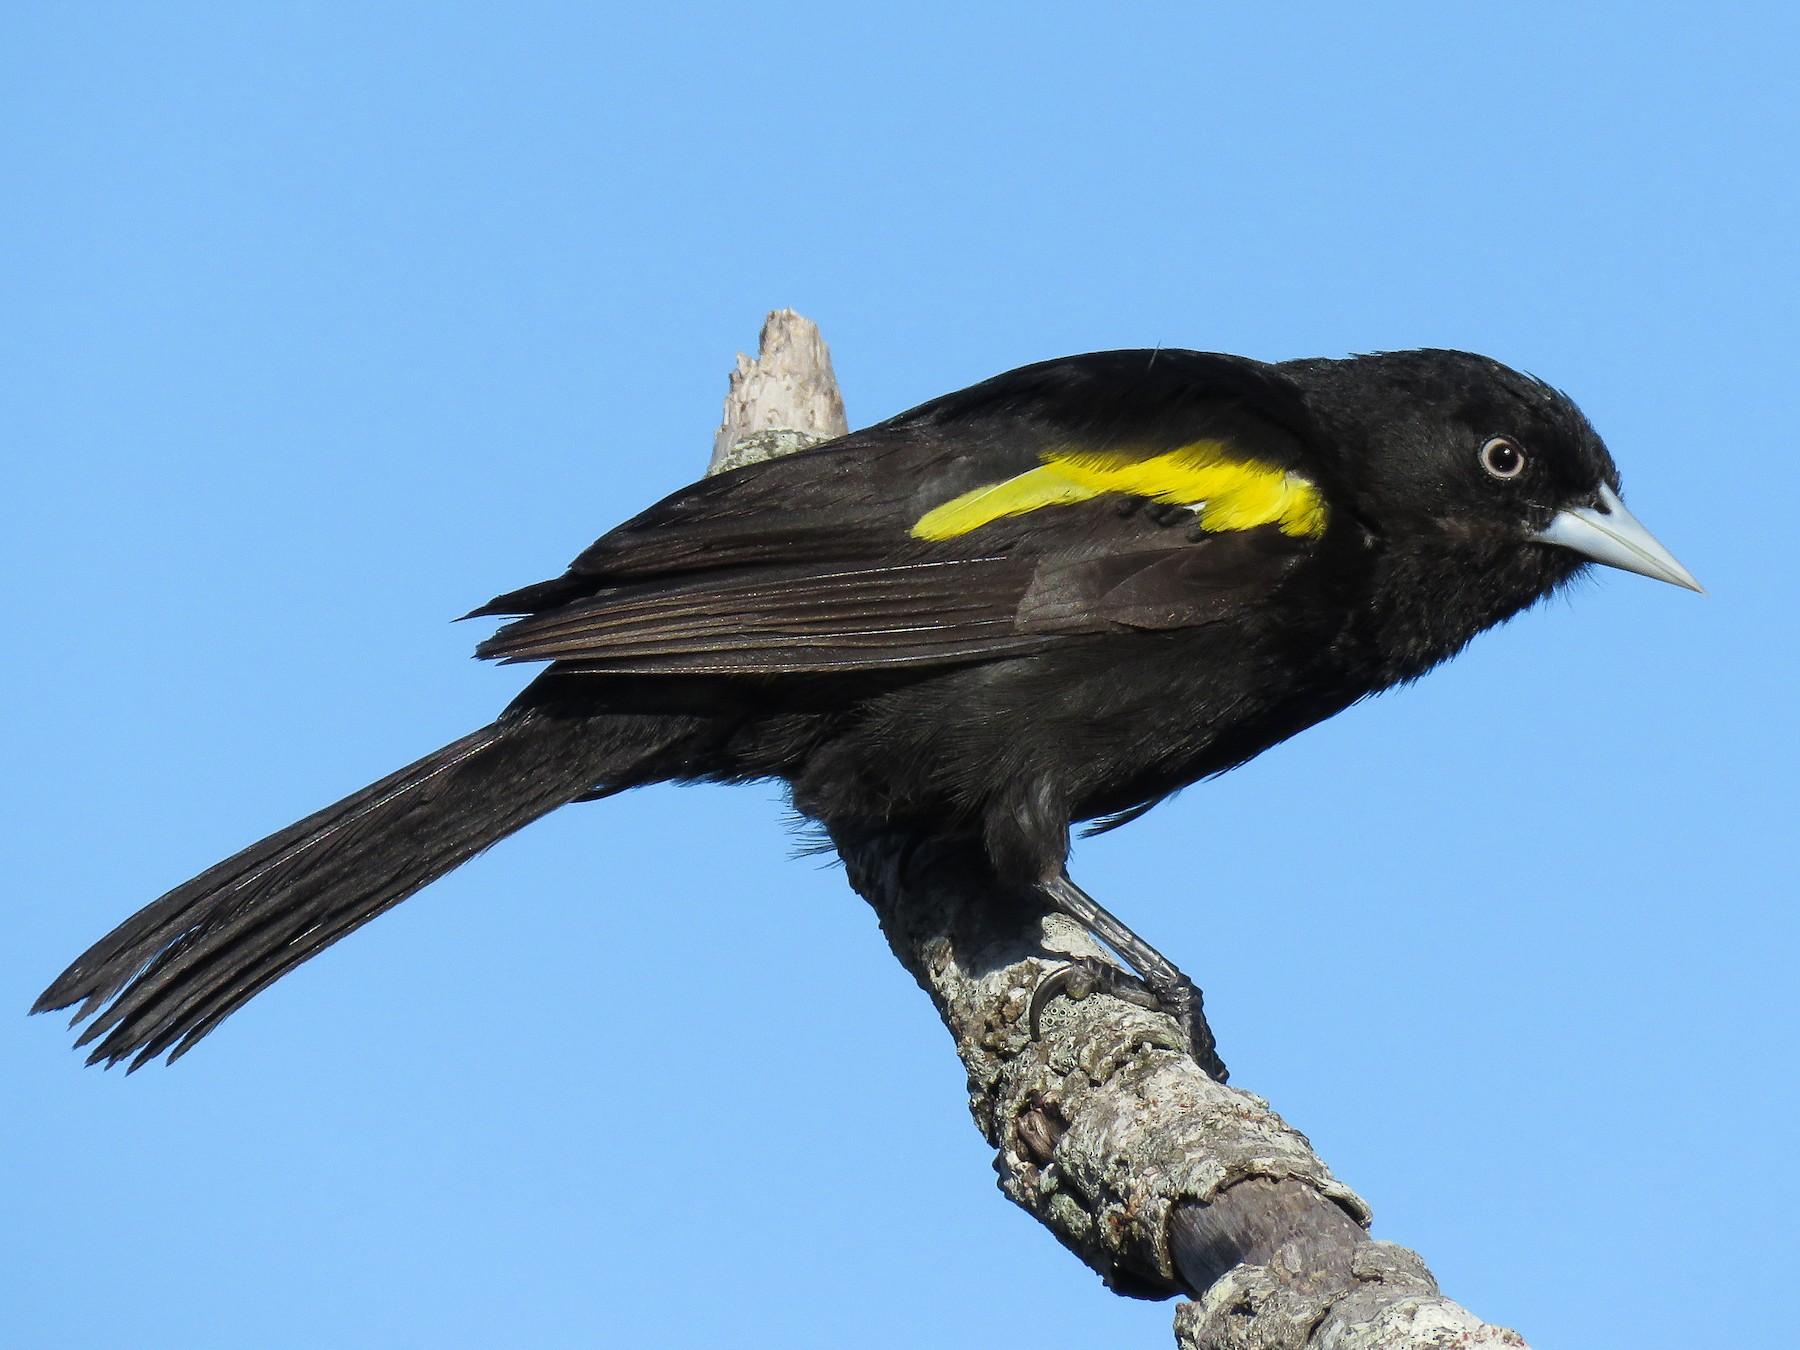 Golden-winged Cacique - Raphael Kurz -  Aves do Sul